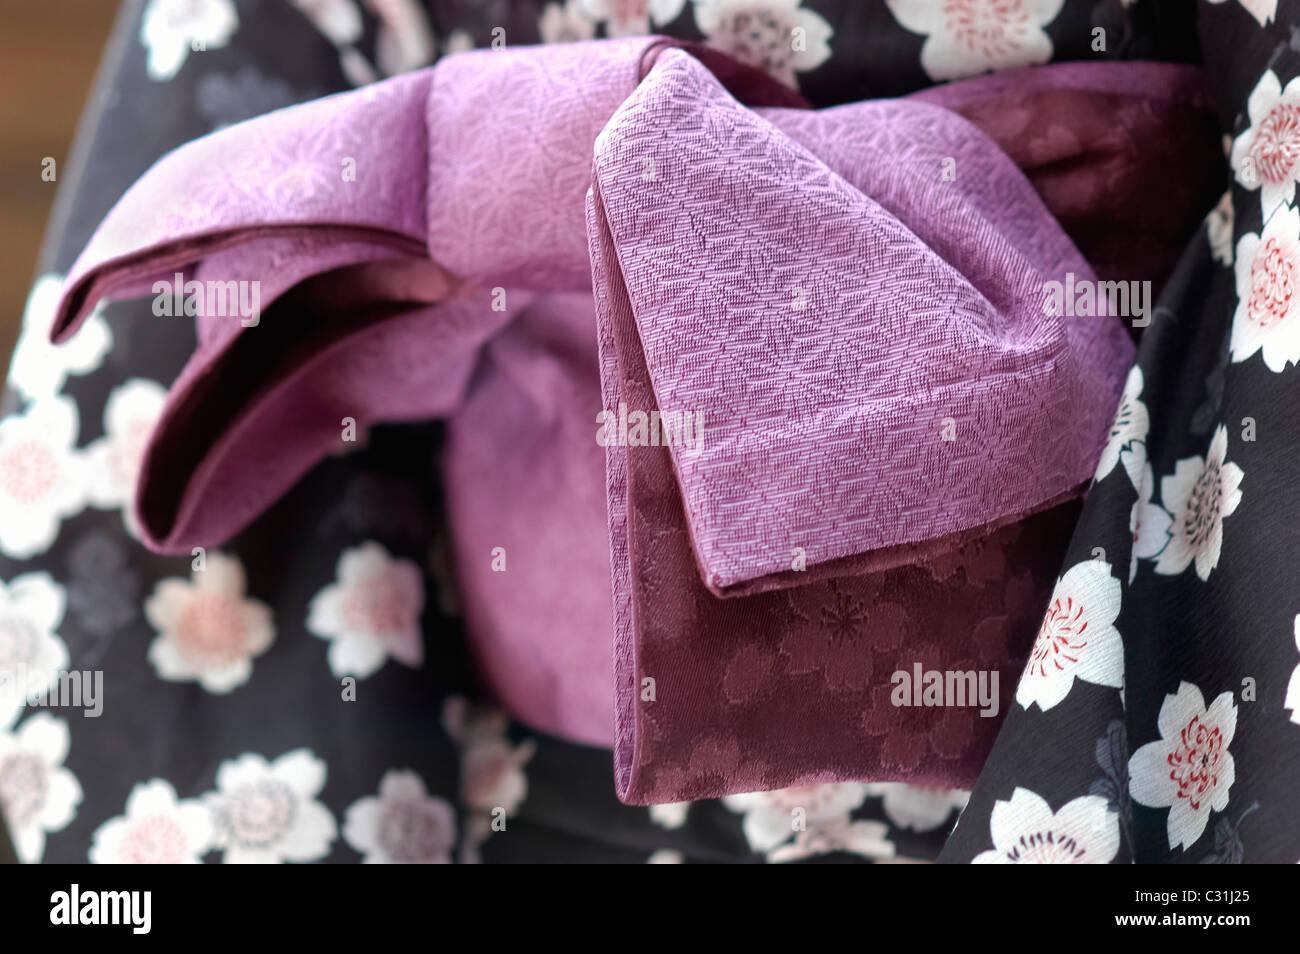 Panchina Giardino Obi : Cinghia larga obi legato attorno al cotone kimono yukata con